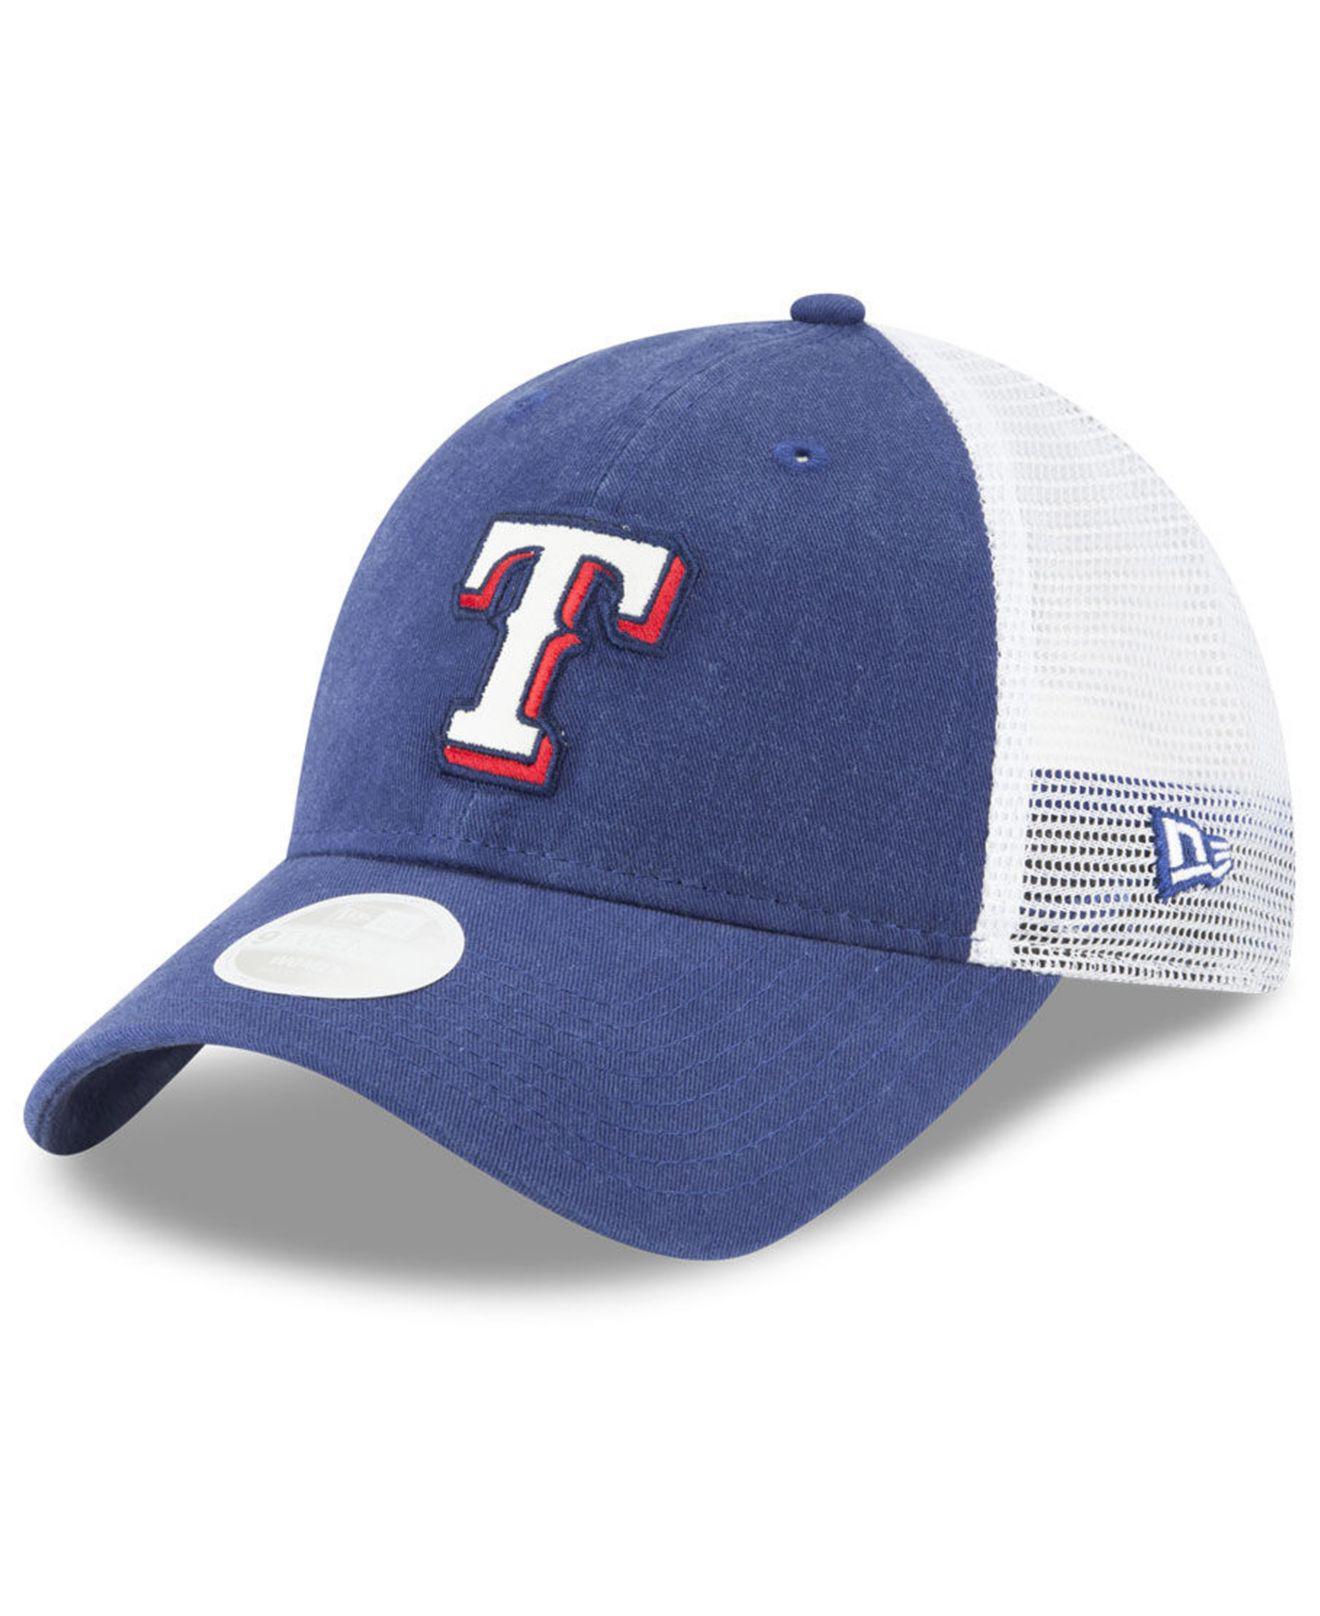 buy popular 4787f 6d941 uk lyst ktz texas rangers trucker shine 9twenty cap in blue for men 30c9a  aa736